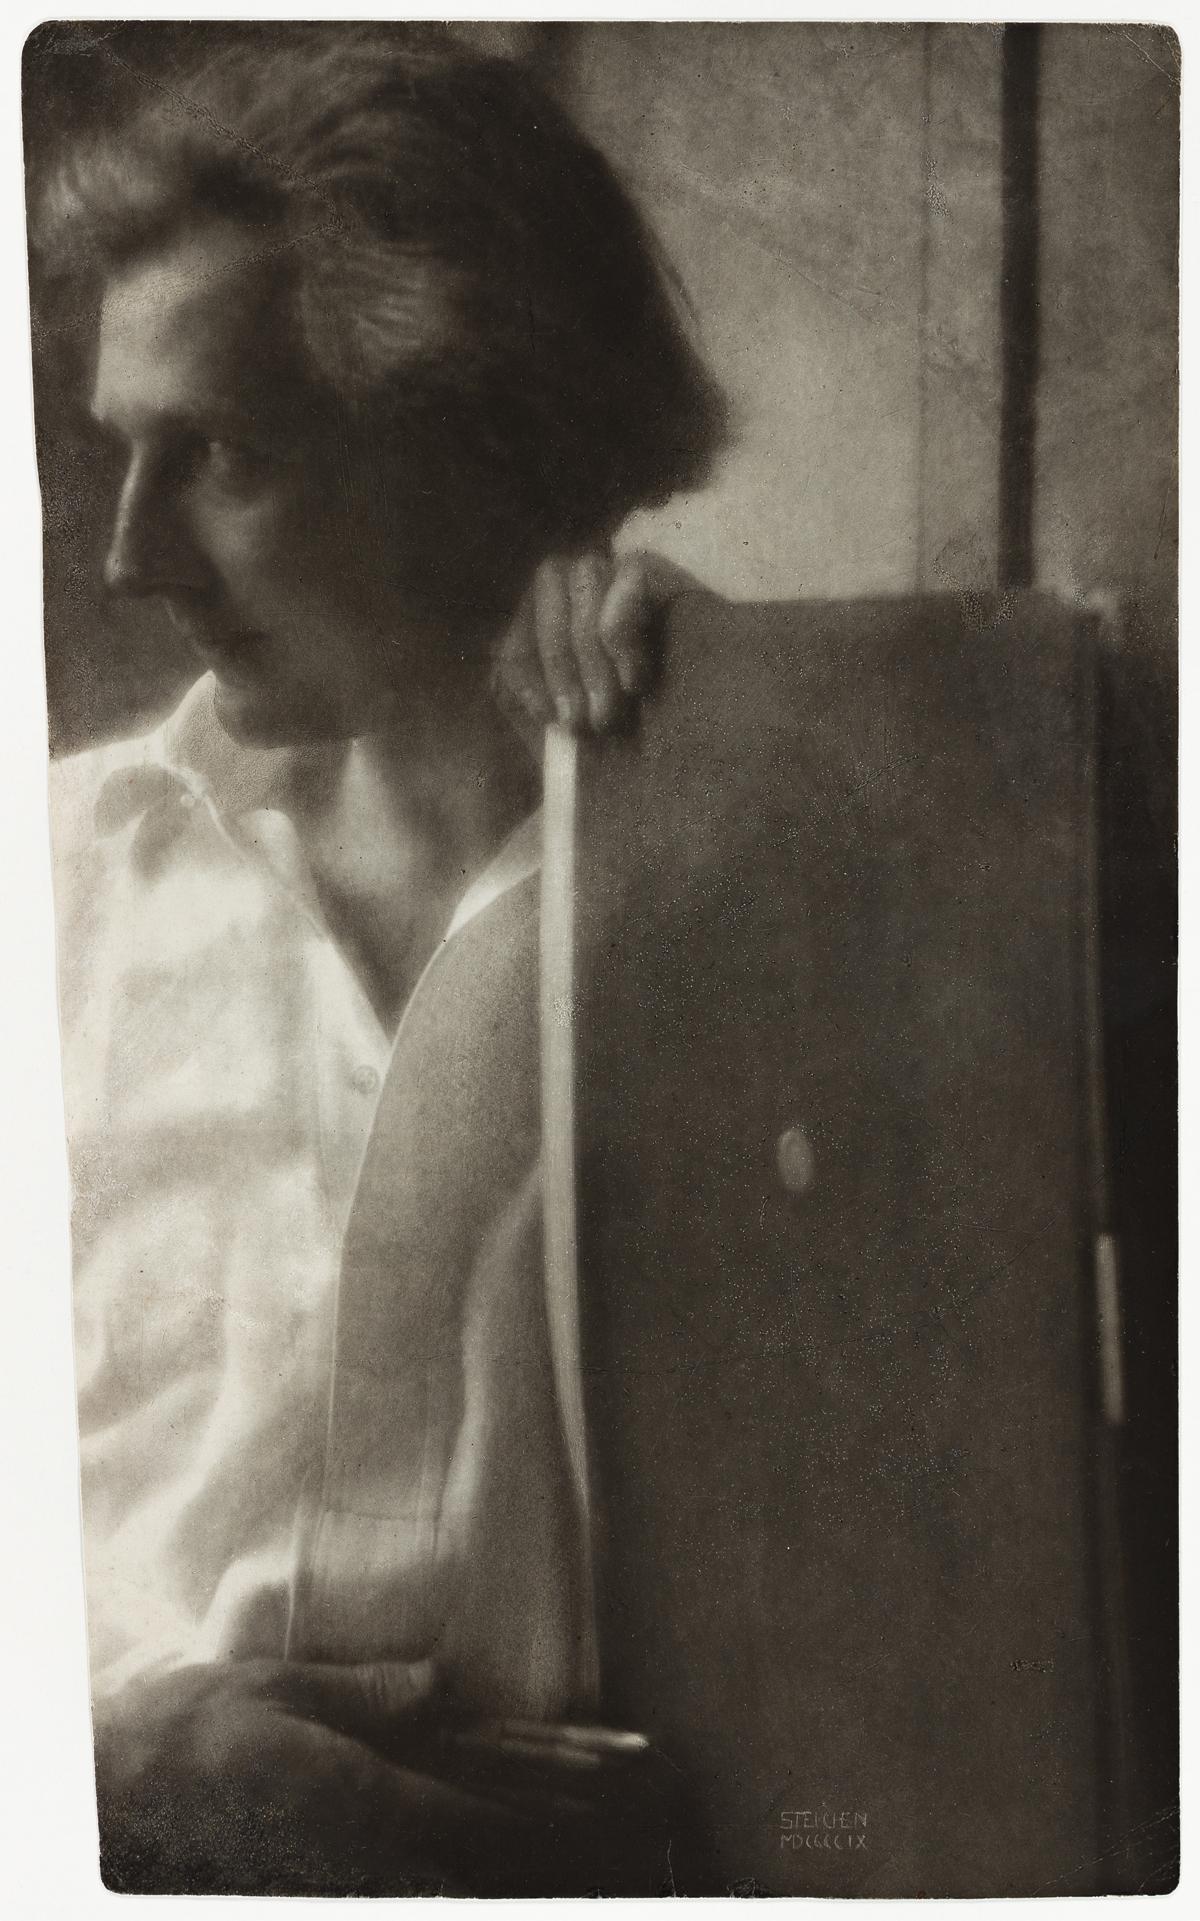 EDWARD STEICHEN (1879-1973) Portrait of Edward Gordon Craig.